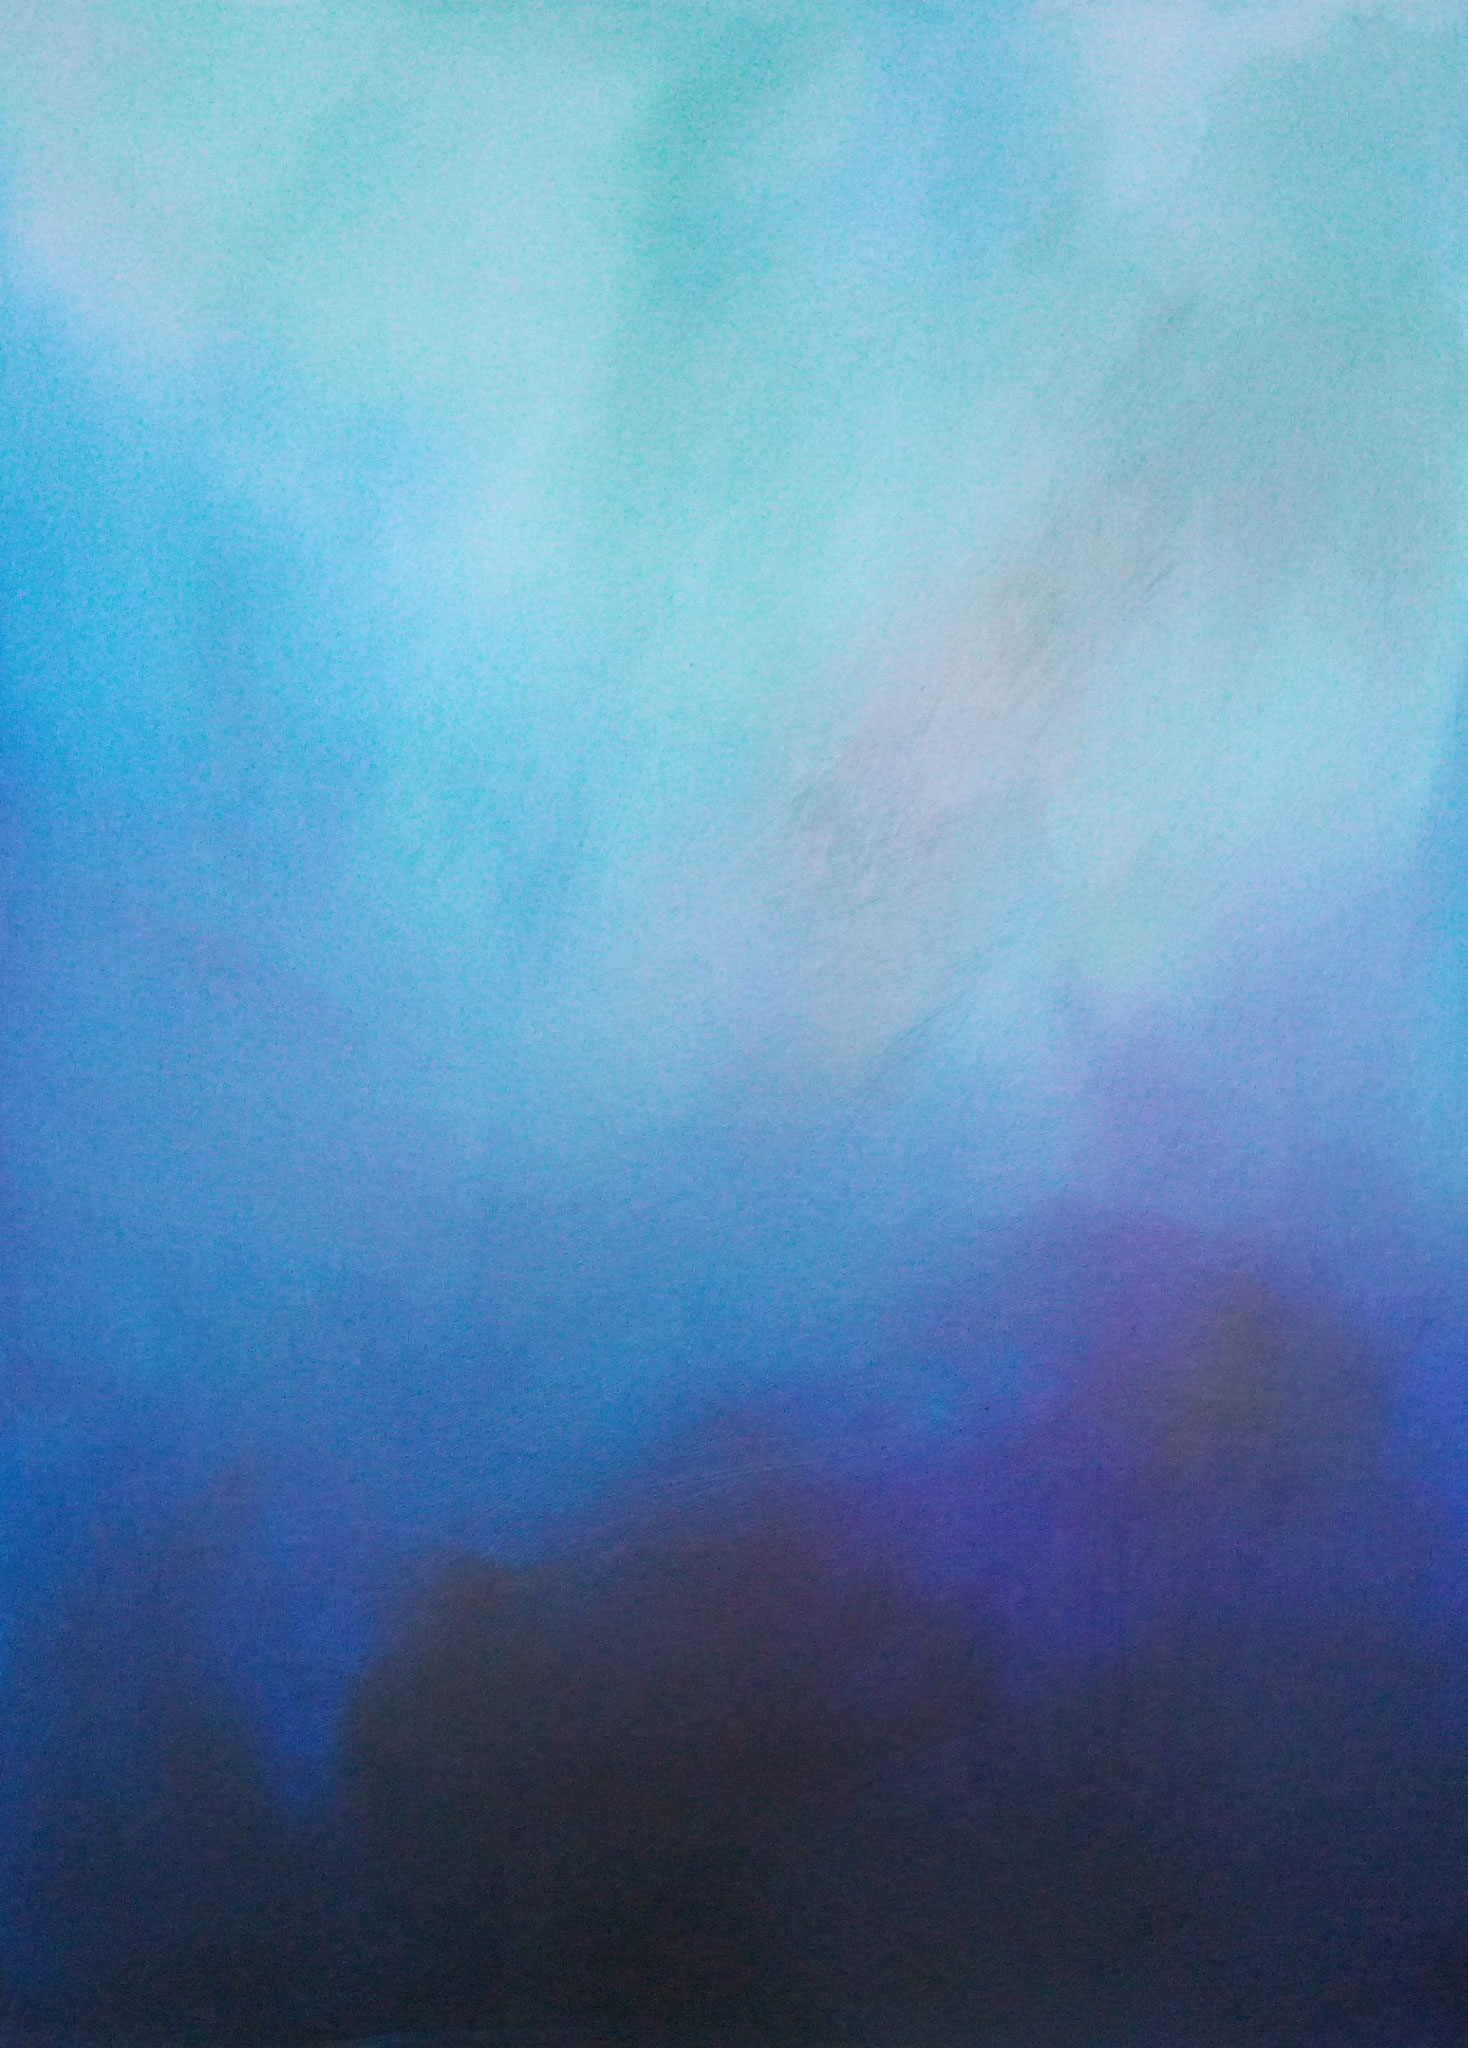 """Meister"" - Acryl auf Malpappe ohne Rahmen, 52x72 cm"